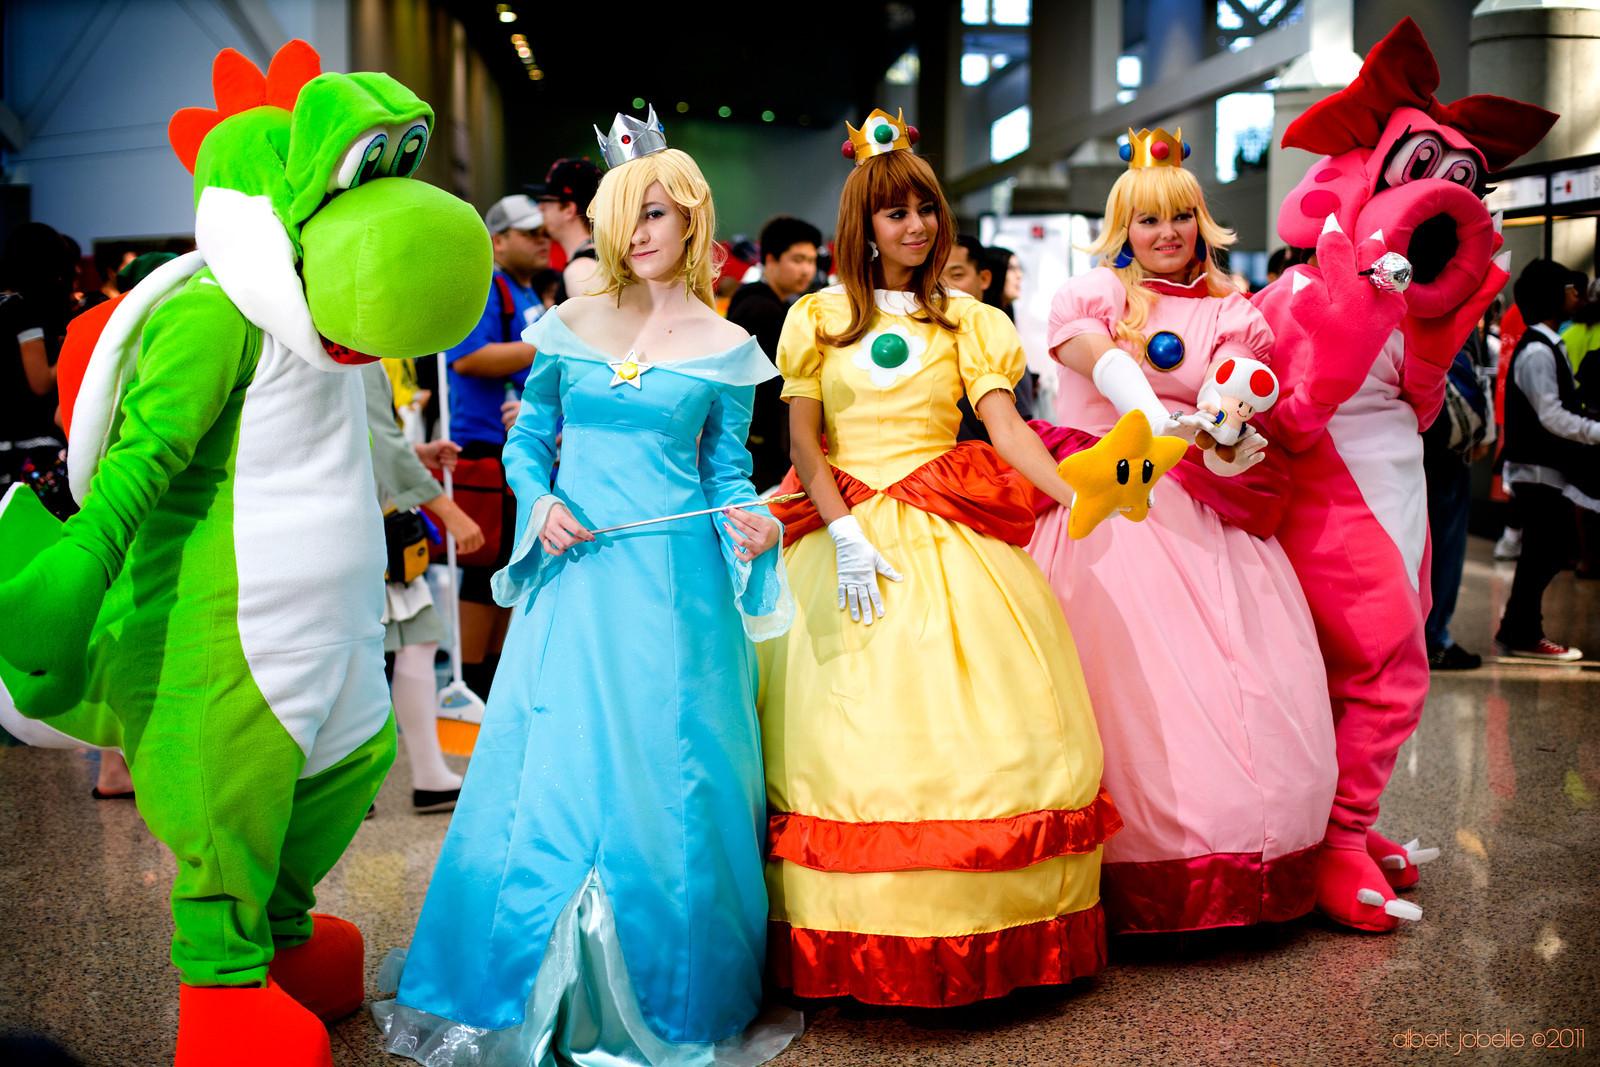 Nintendo Cosplaying Group by Chingrish on DeviantArt